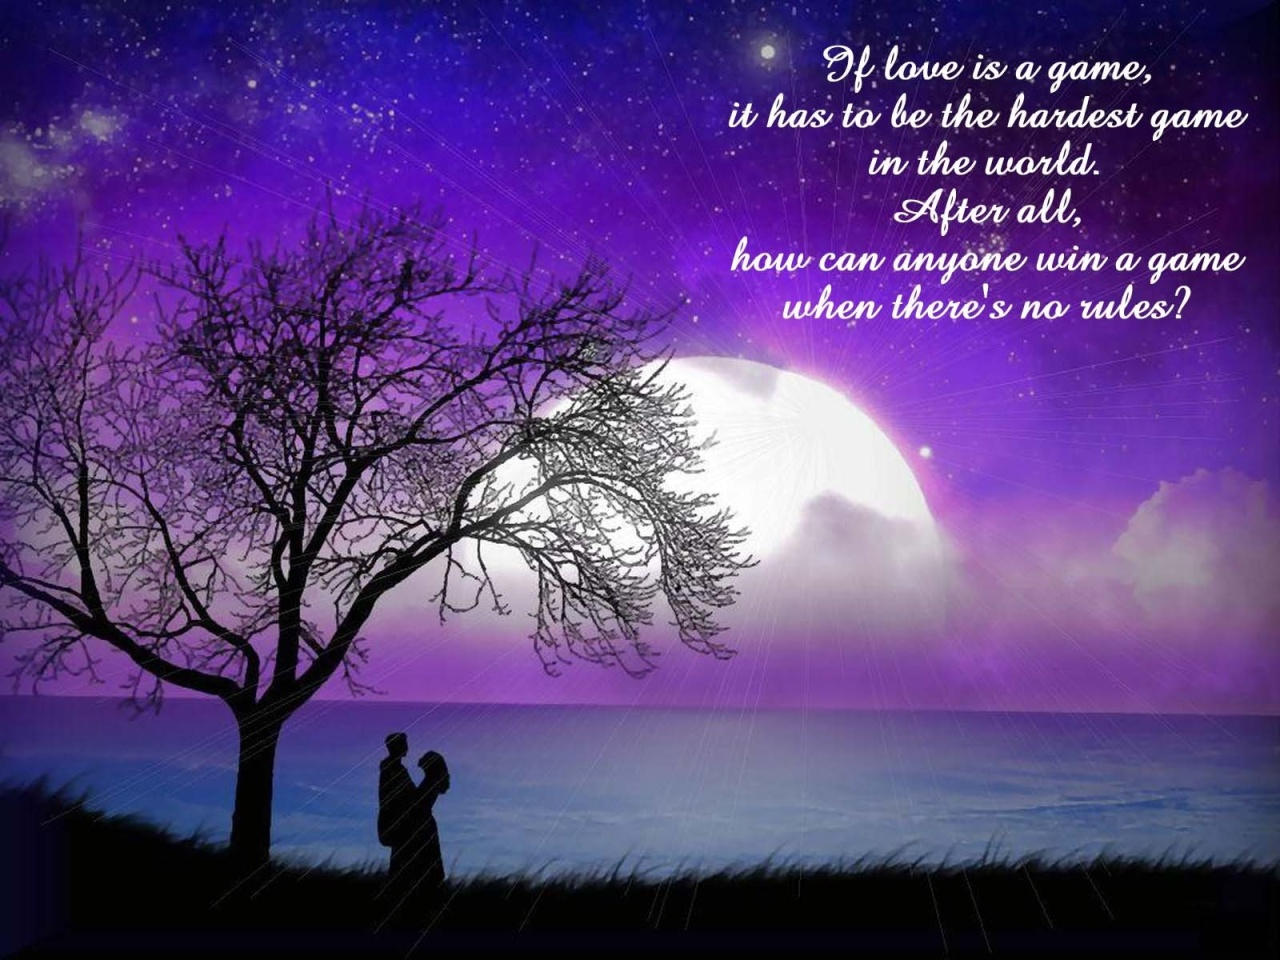 Image quote #6